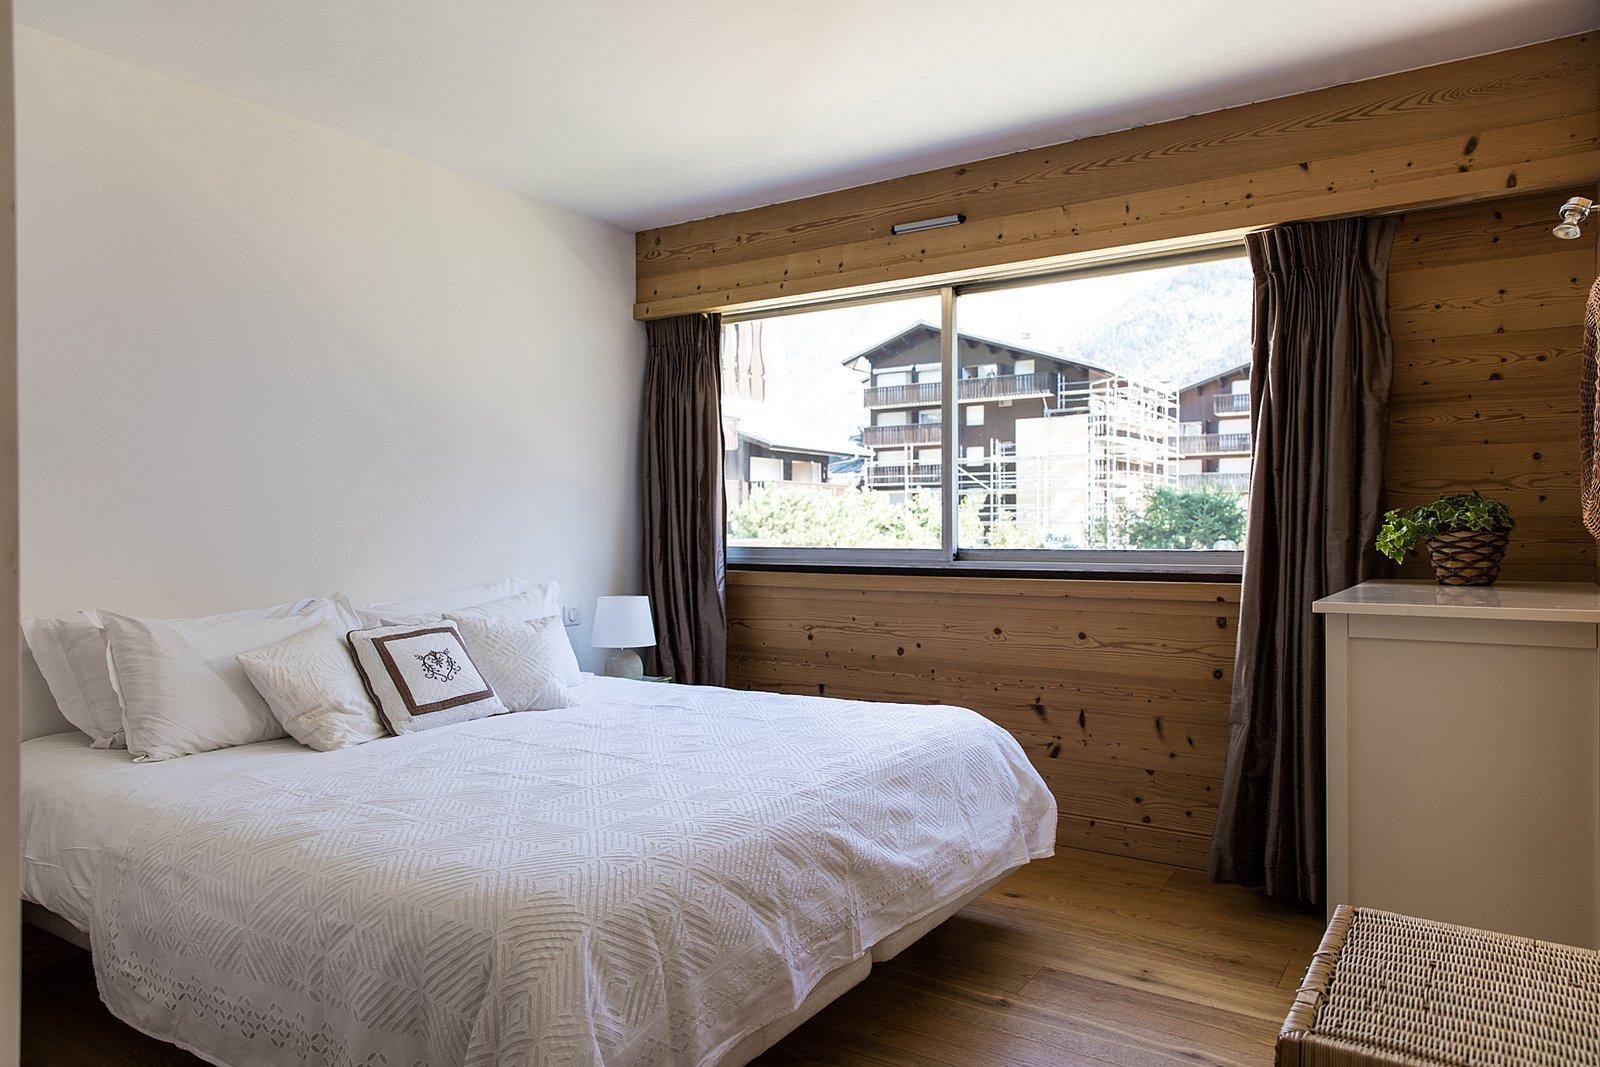 Clos du Savoy Apartment, Chamonix: Self-catering accommodation